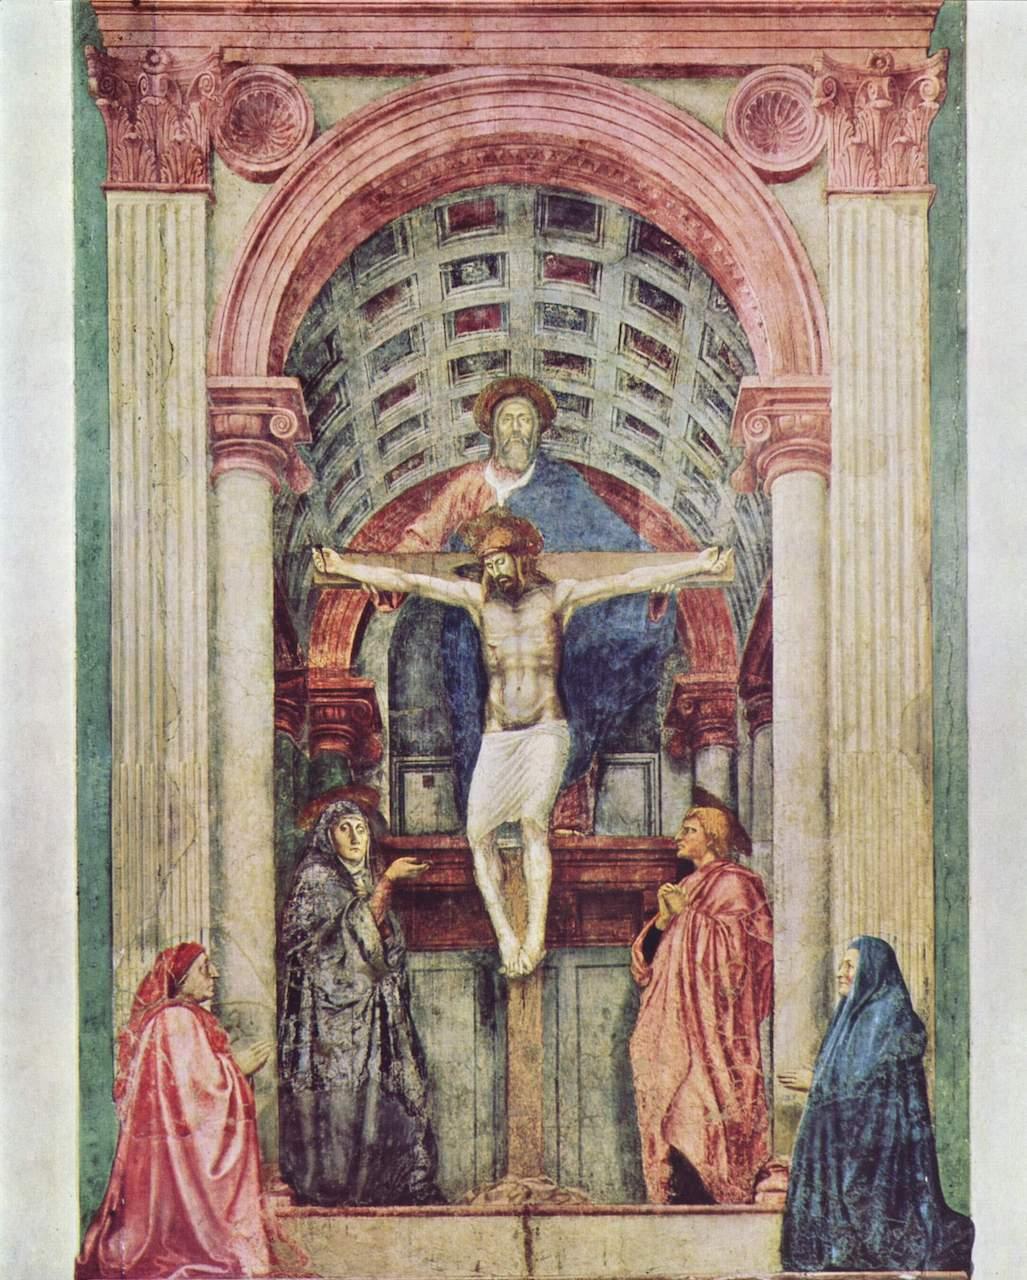 Masaccio. Dreifaltigkeit. 1427. Fresko. 667 x 317cm. S. Maria Novella, Florenz